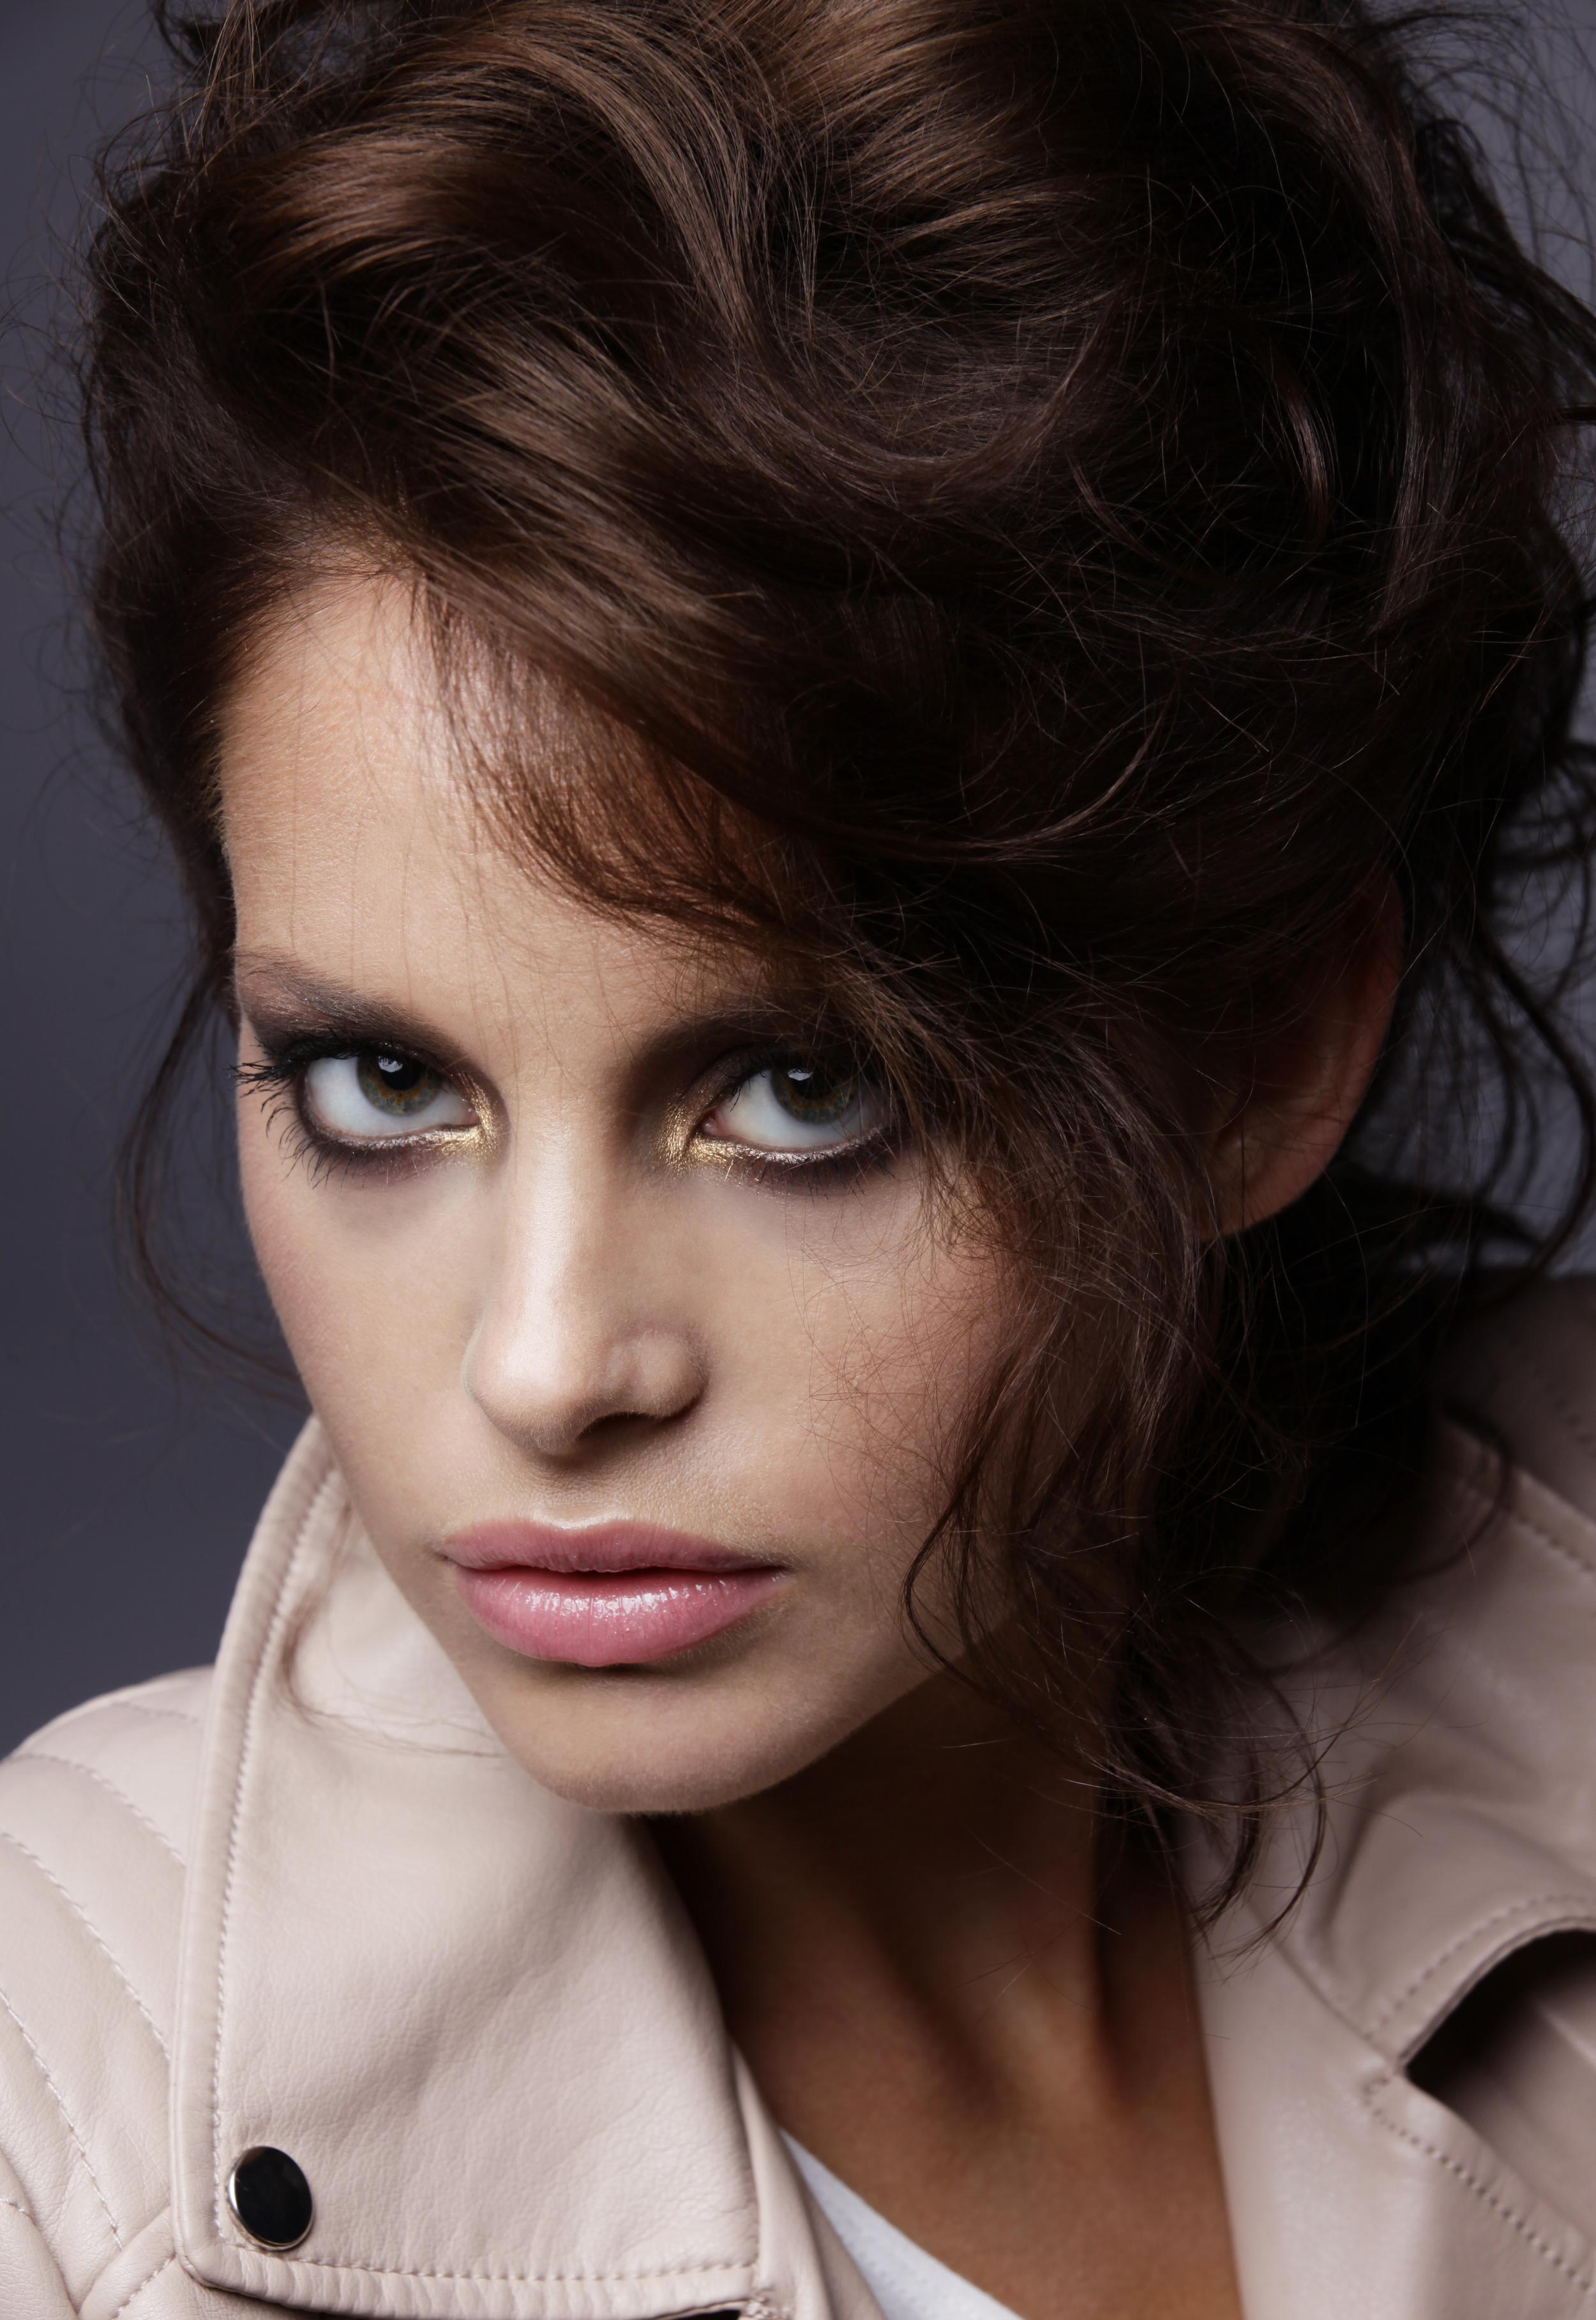 Model: Sandra Stokka Hair & make-up: Shlomi Ruimi